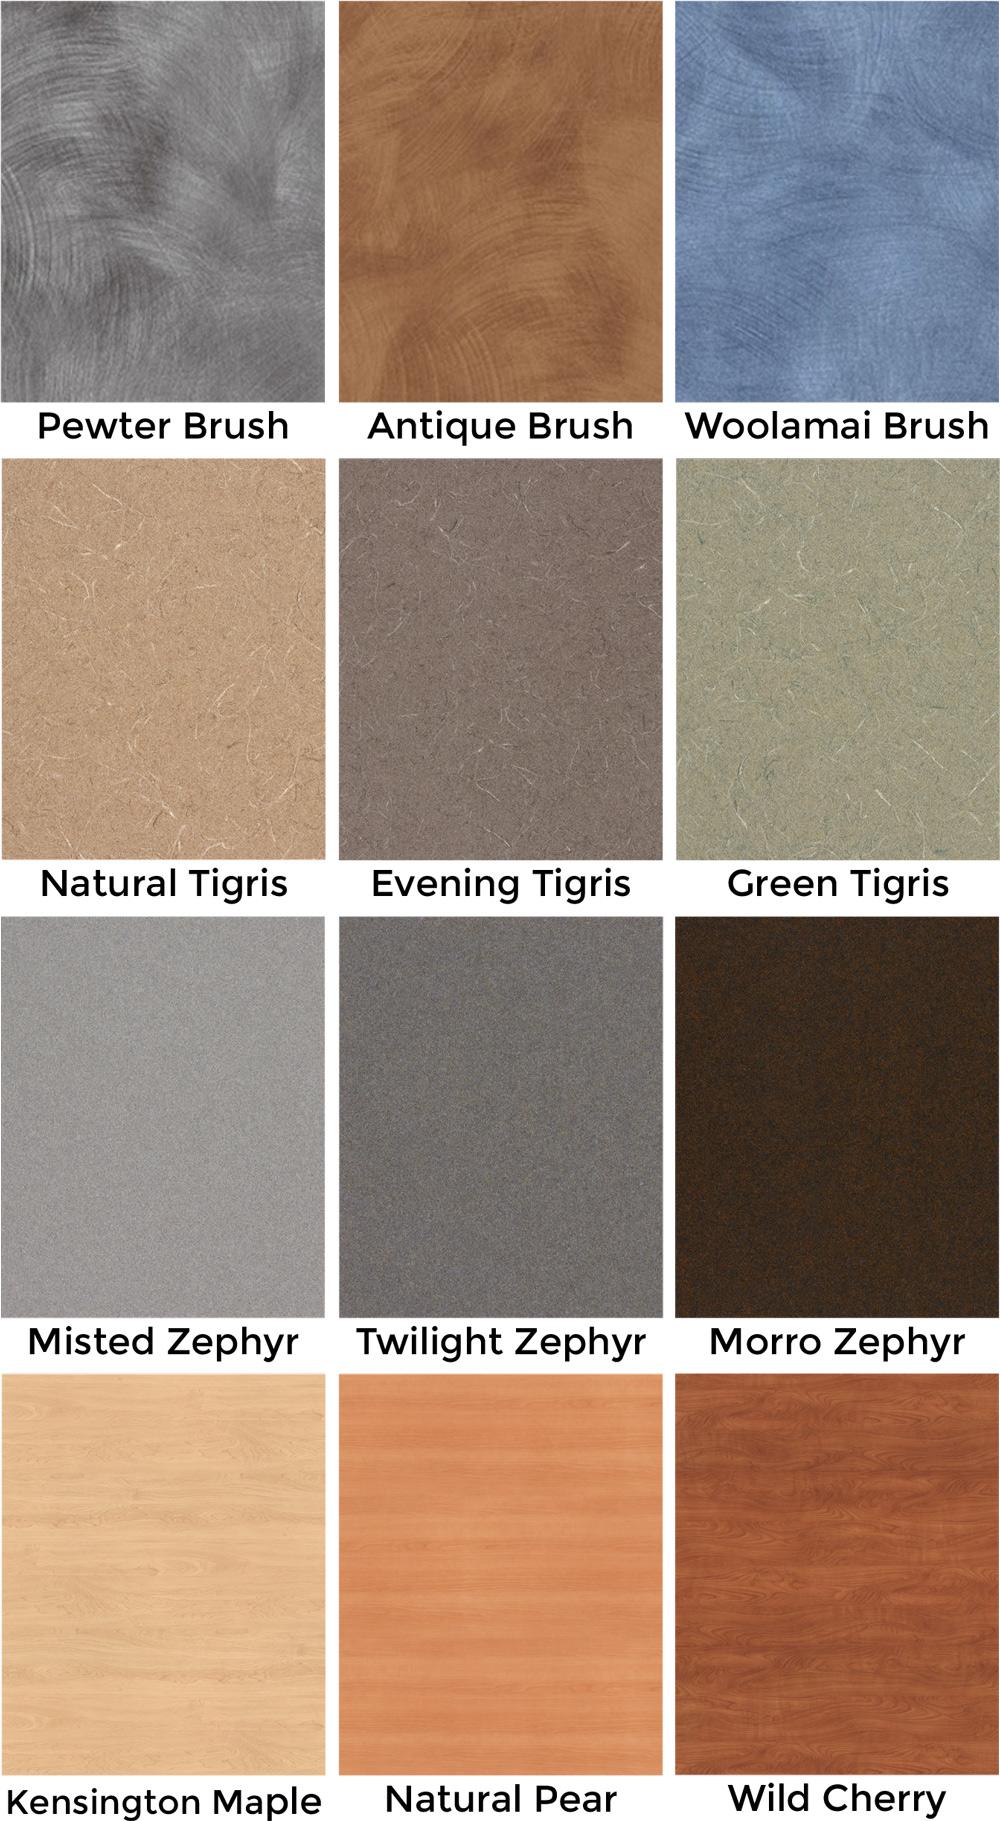 Custom Comfort Laminate Colors - Patterned